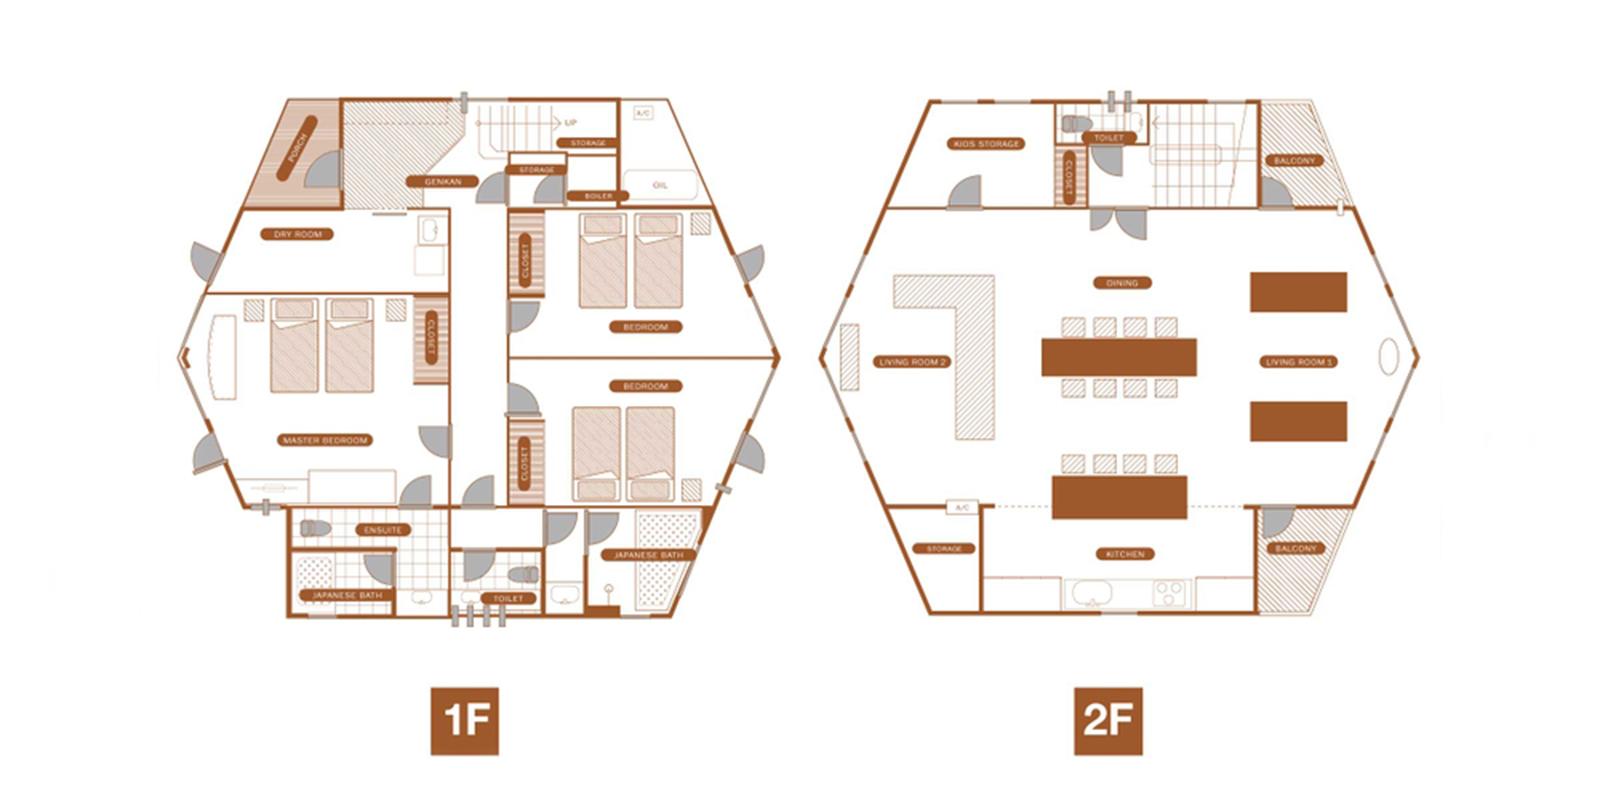 The Orchards Niseko Kaki Floor Plan | St Moritz, Niseko